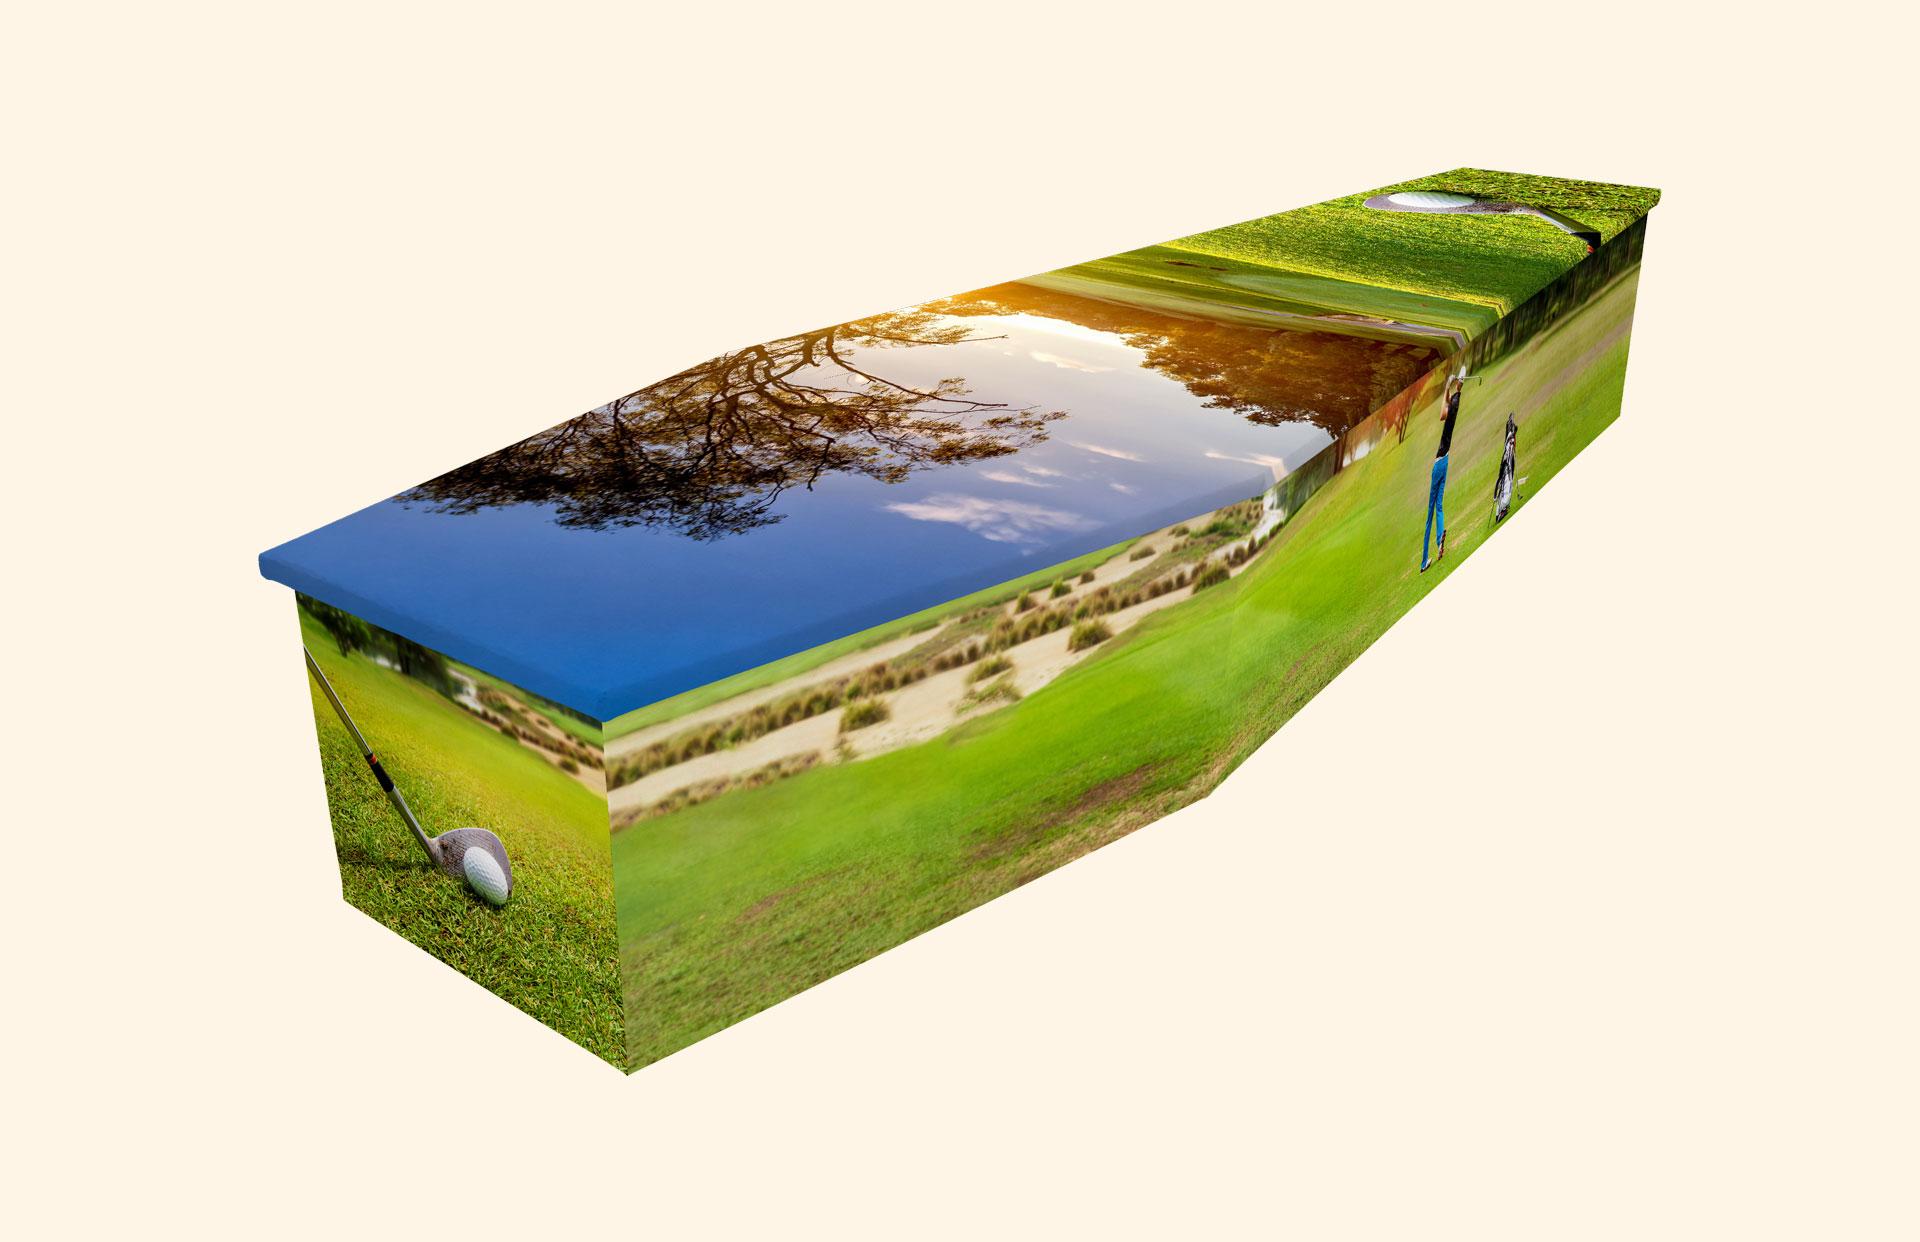 Hole in One cardboard coffin